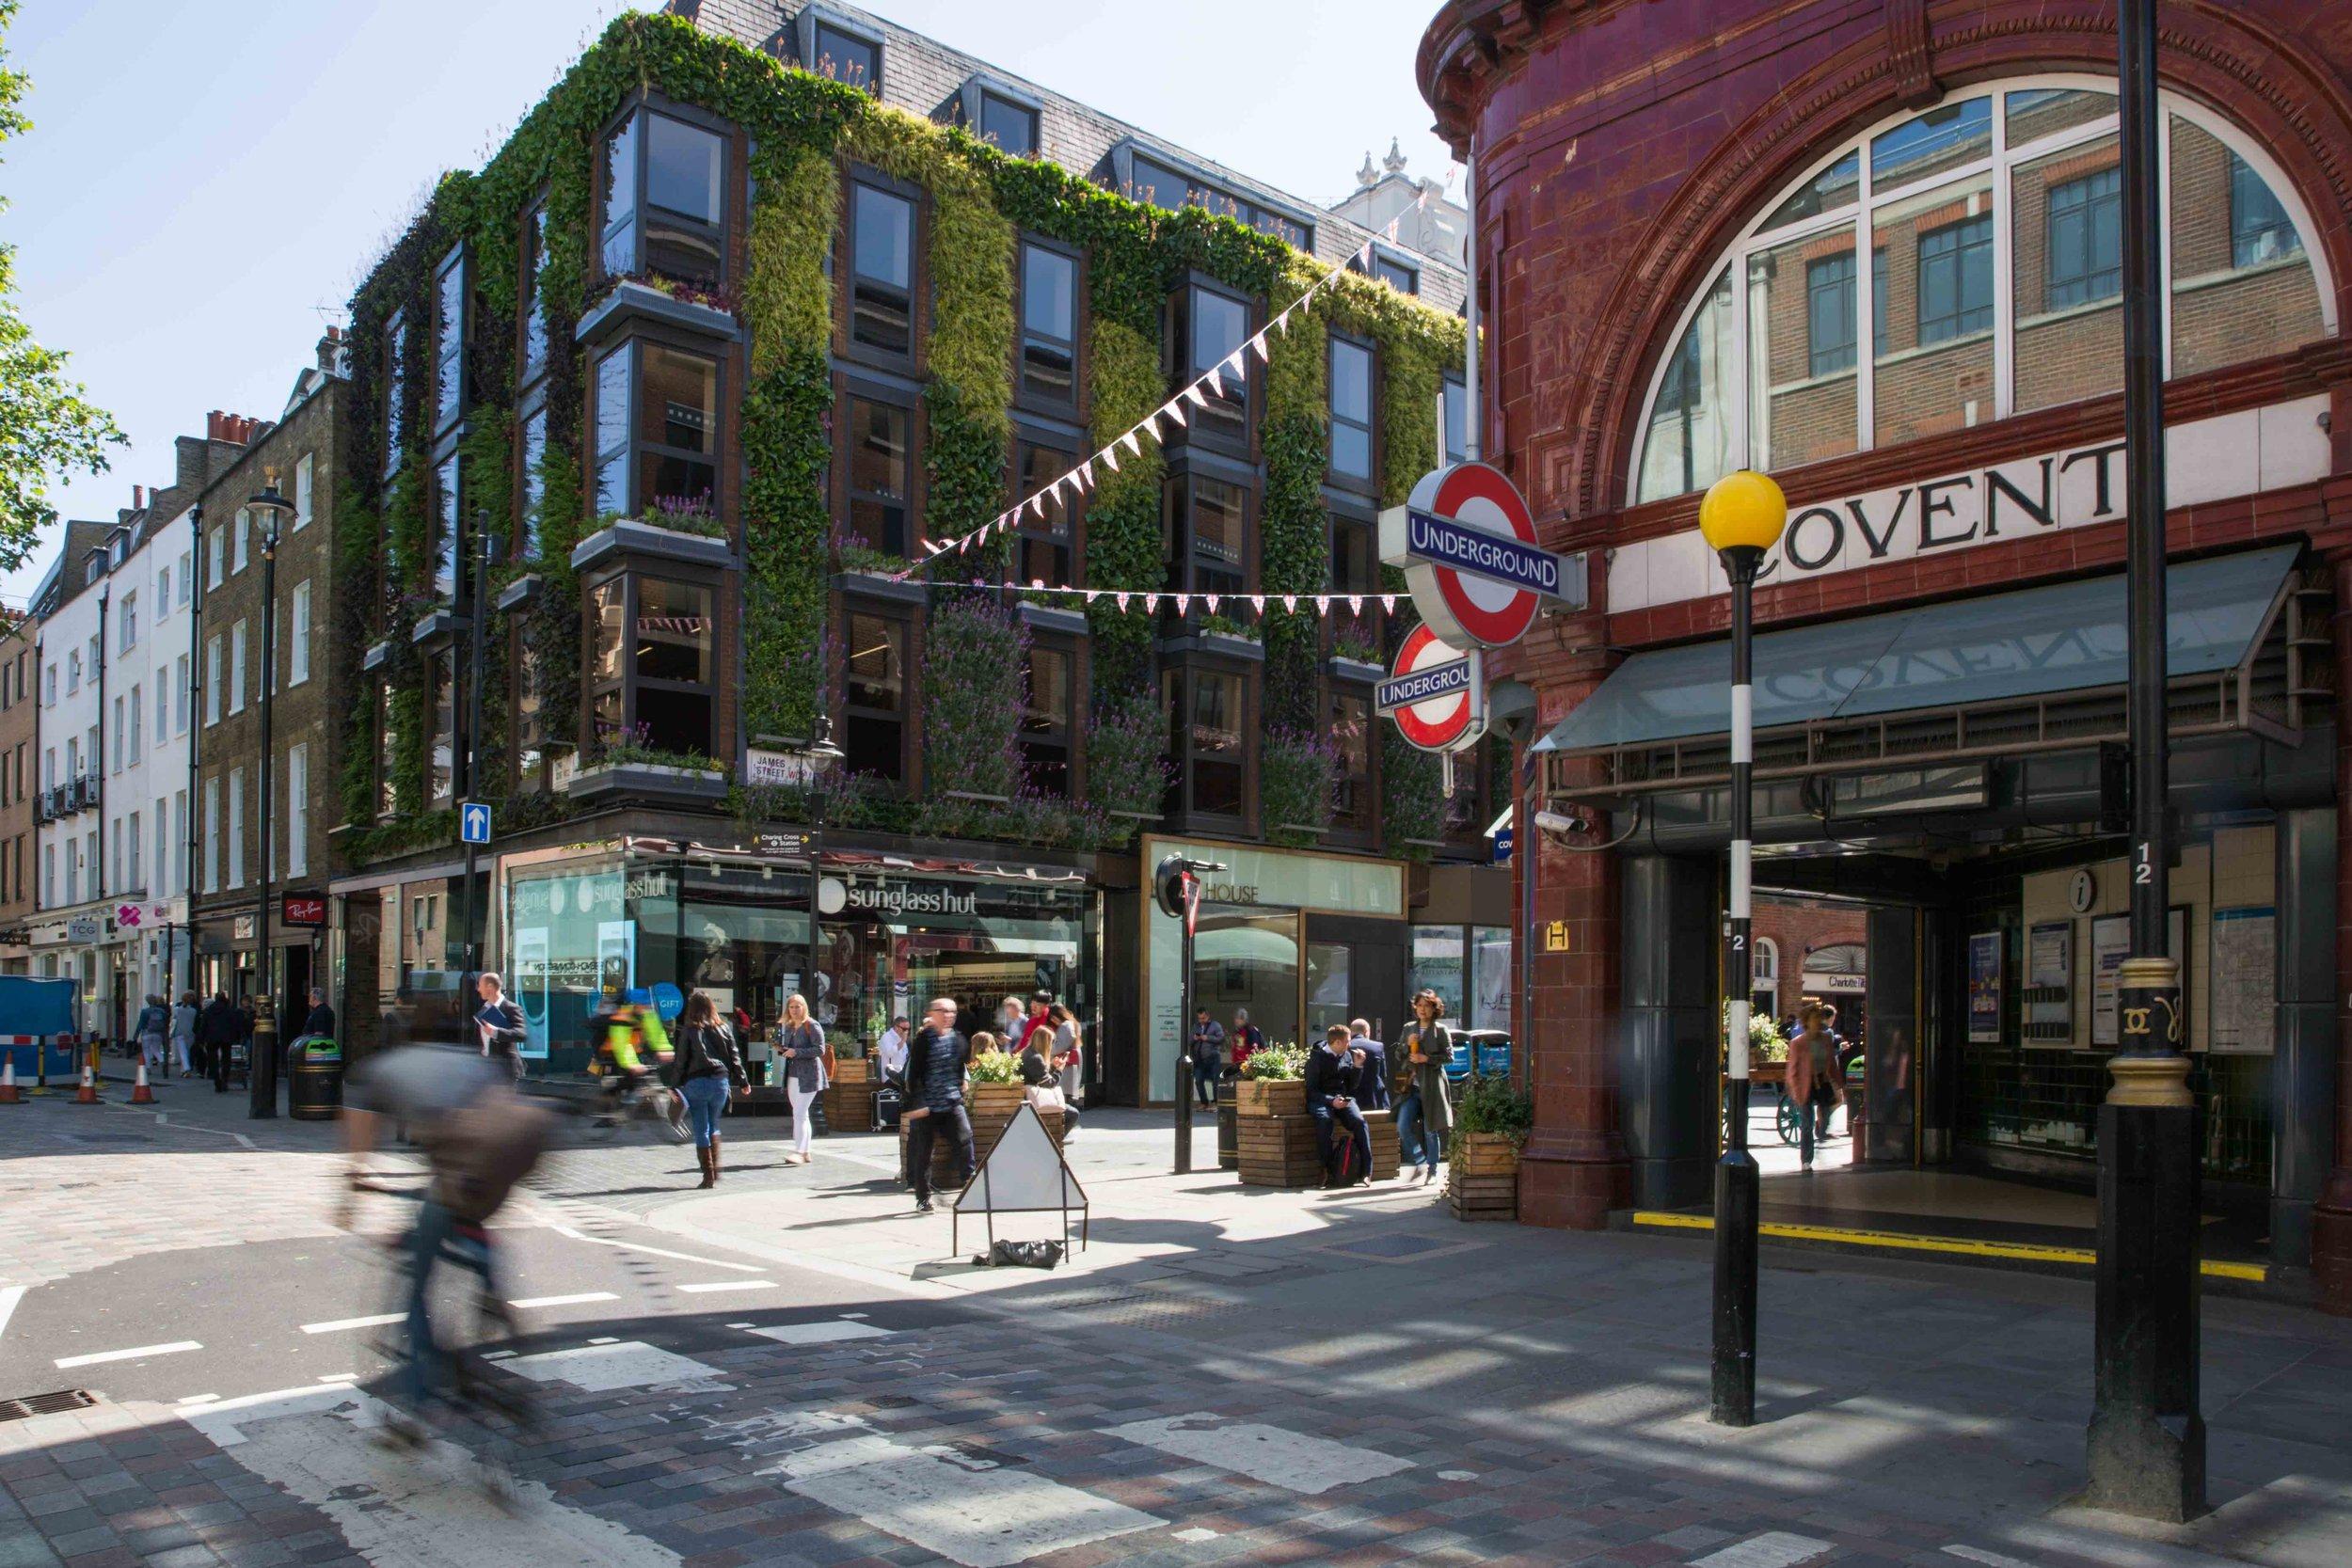 JCTP0104-Covent Garden-London-UK-mcconaghy-17.jpg